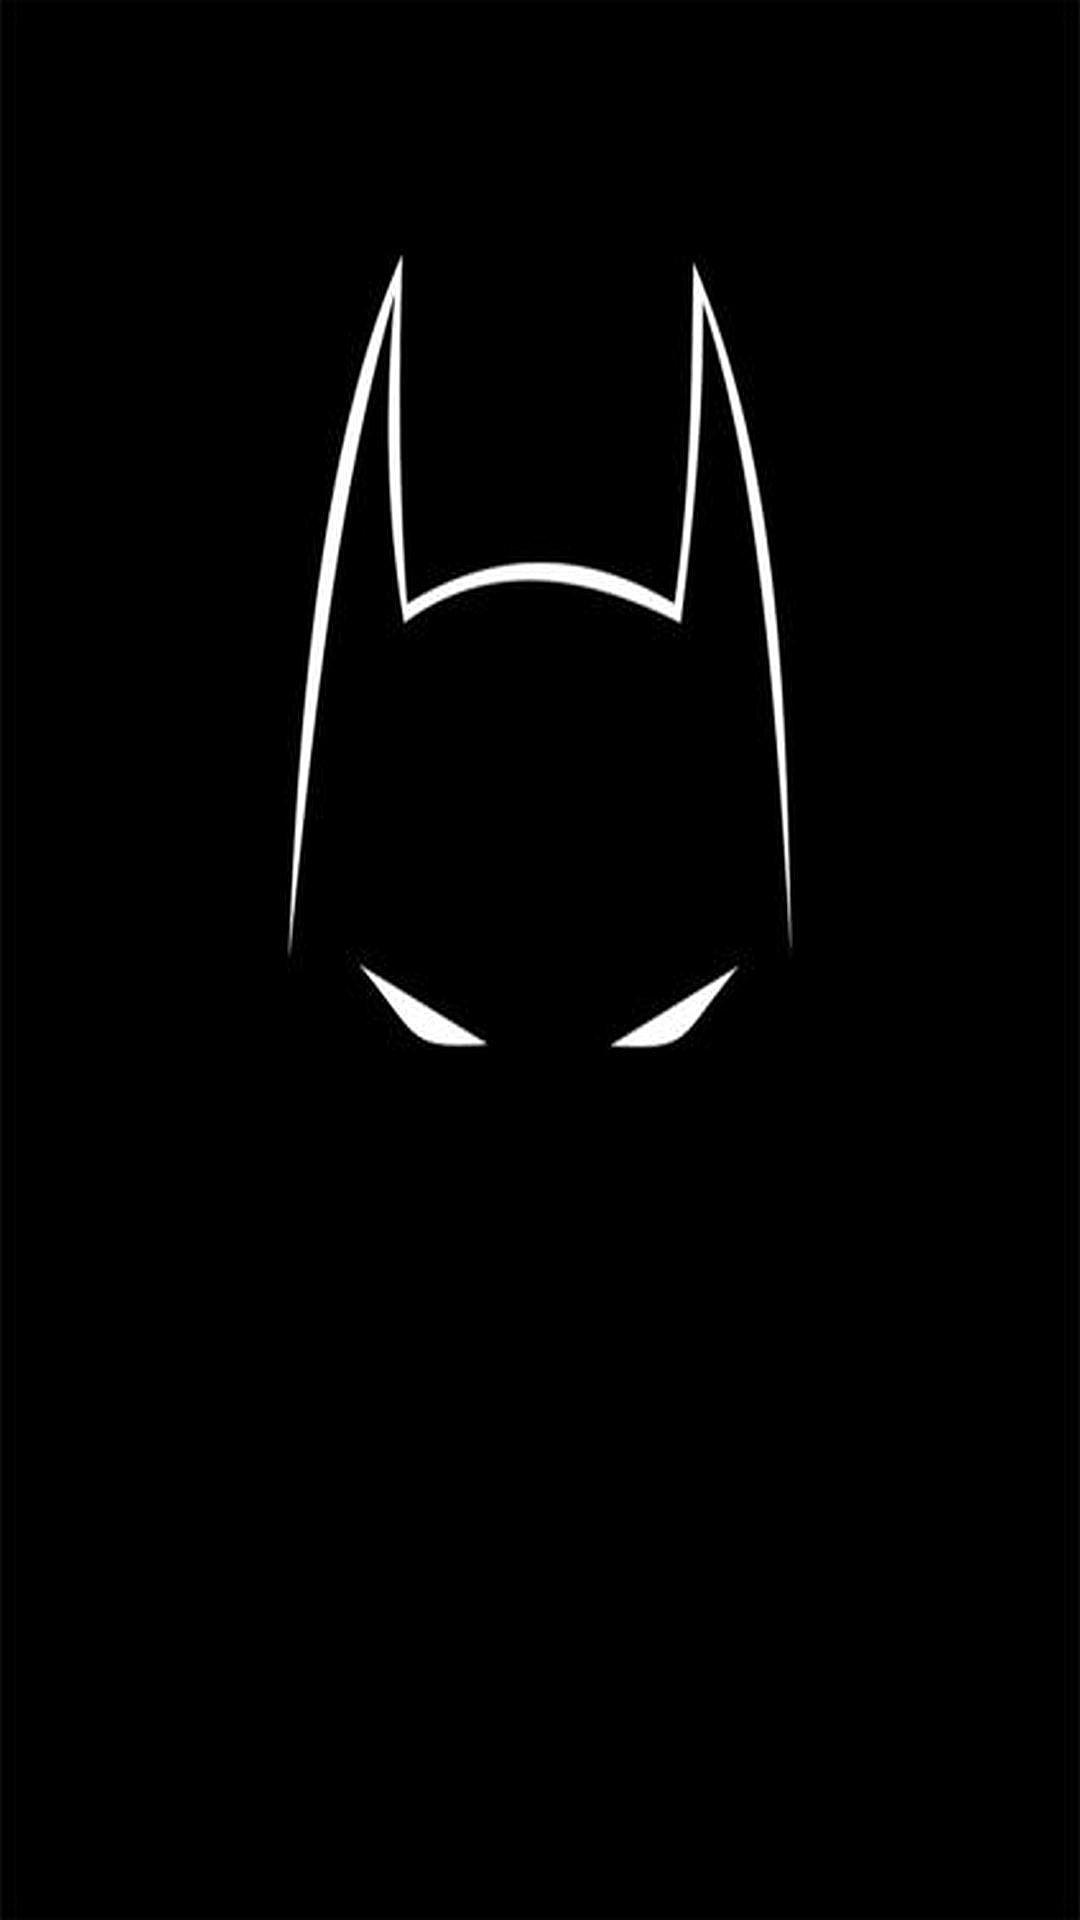 Batman Lock Screen Wallpaper 63 Images